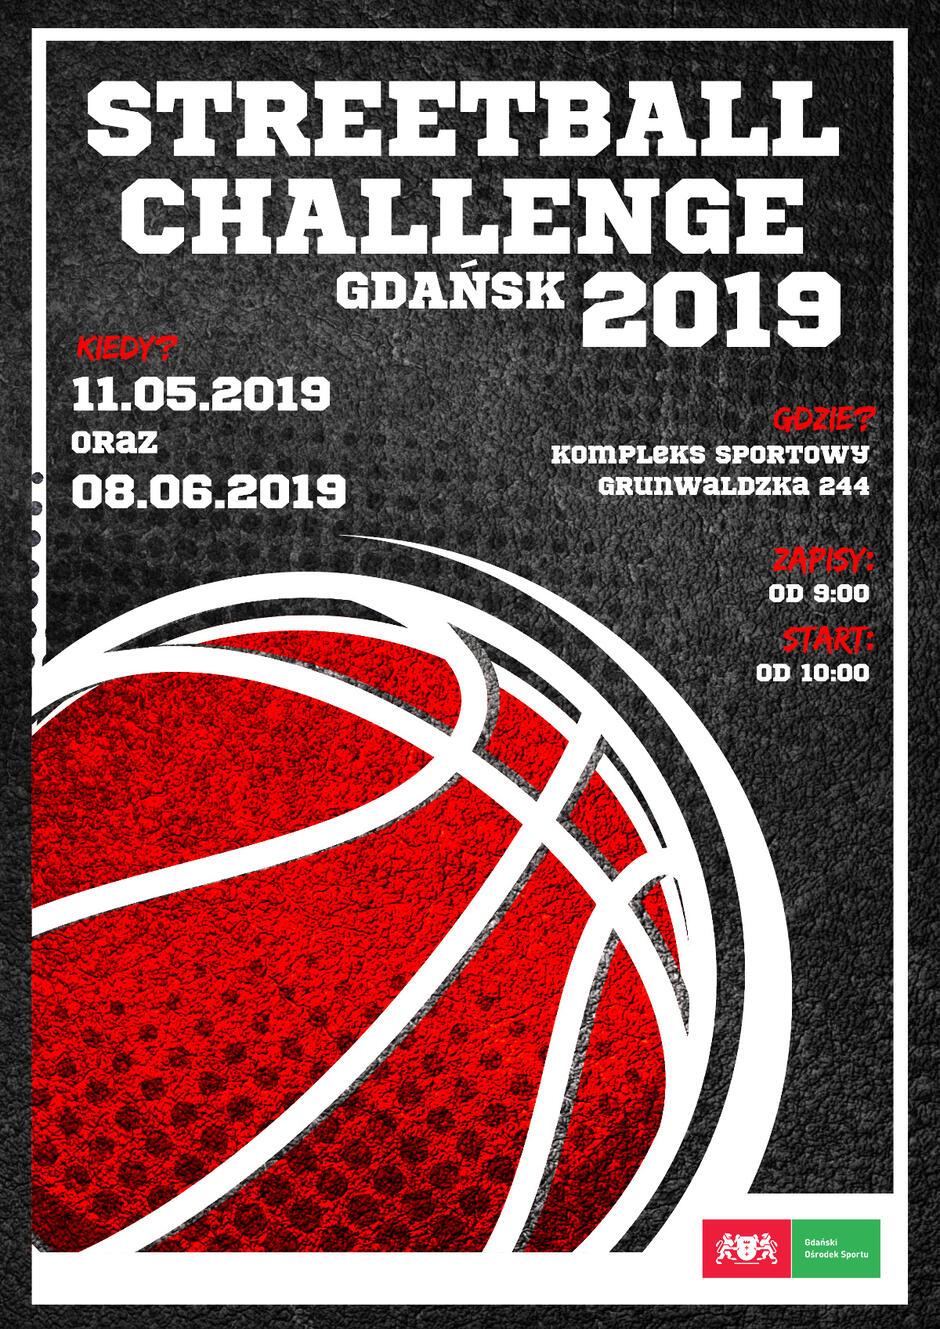 Gdańsk Streetball Challenge 2019